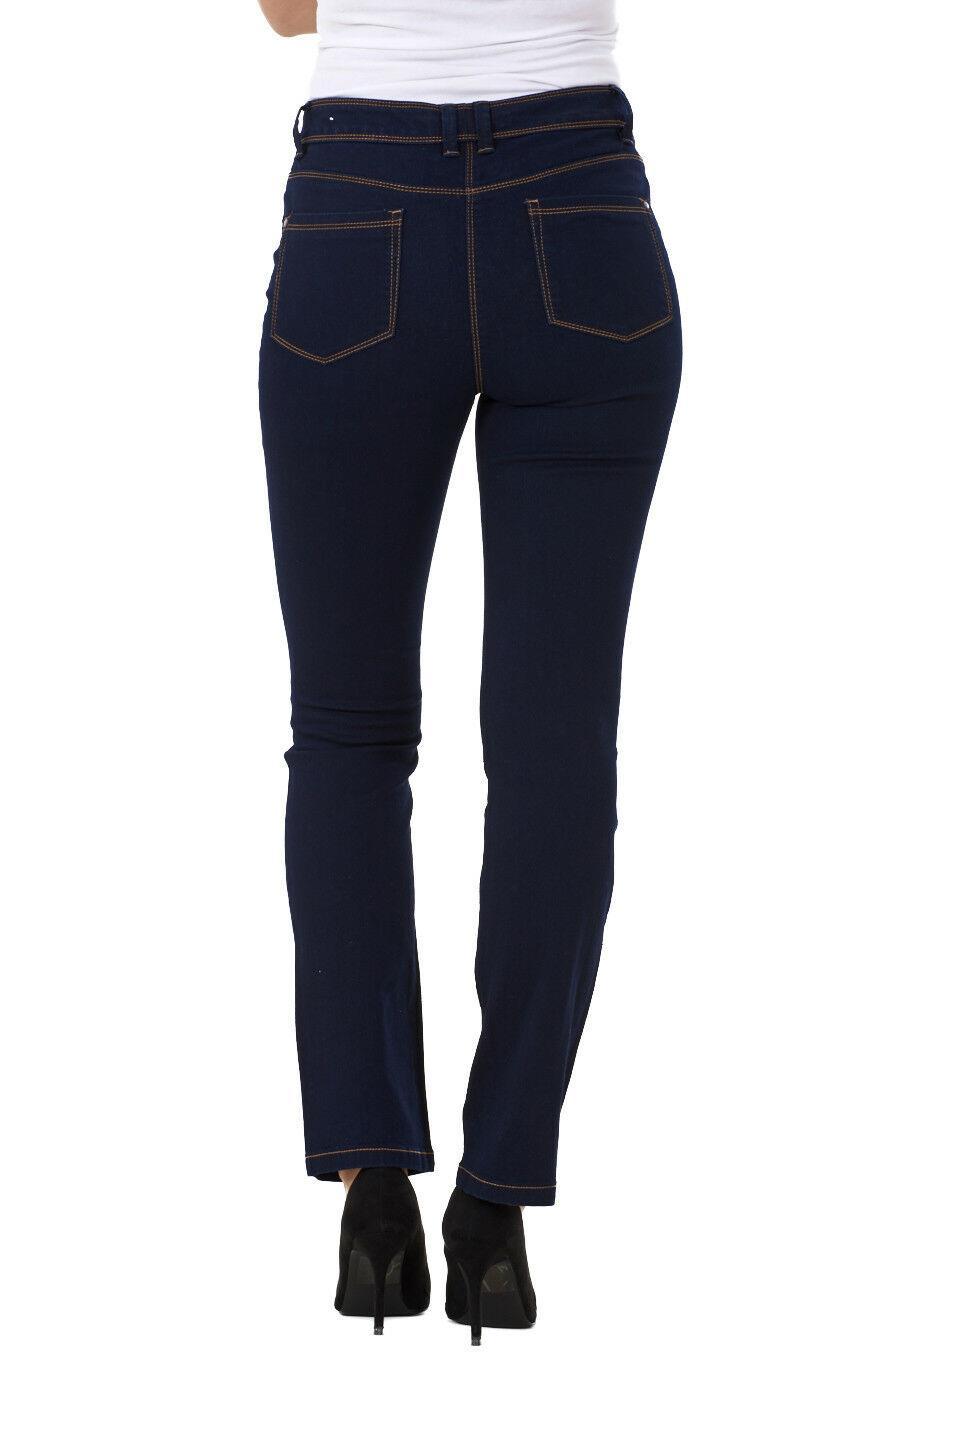 Ladies-Straight-Leg-Denim-Womens-Pants-Stretch-Regular-Fit-Jeans thumbnail 18